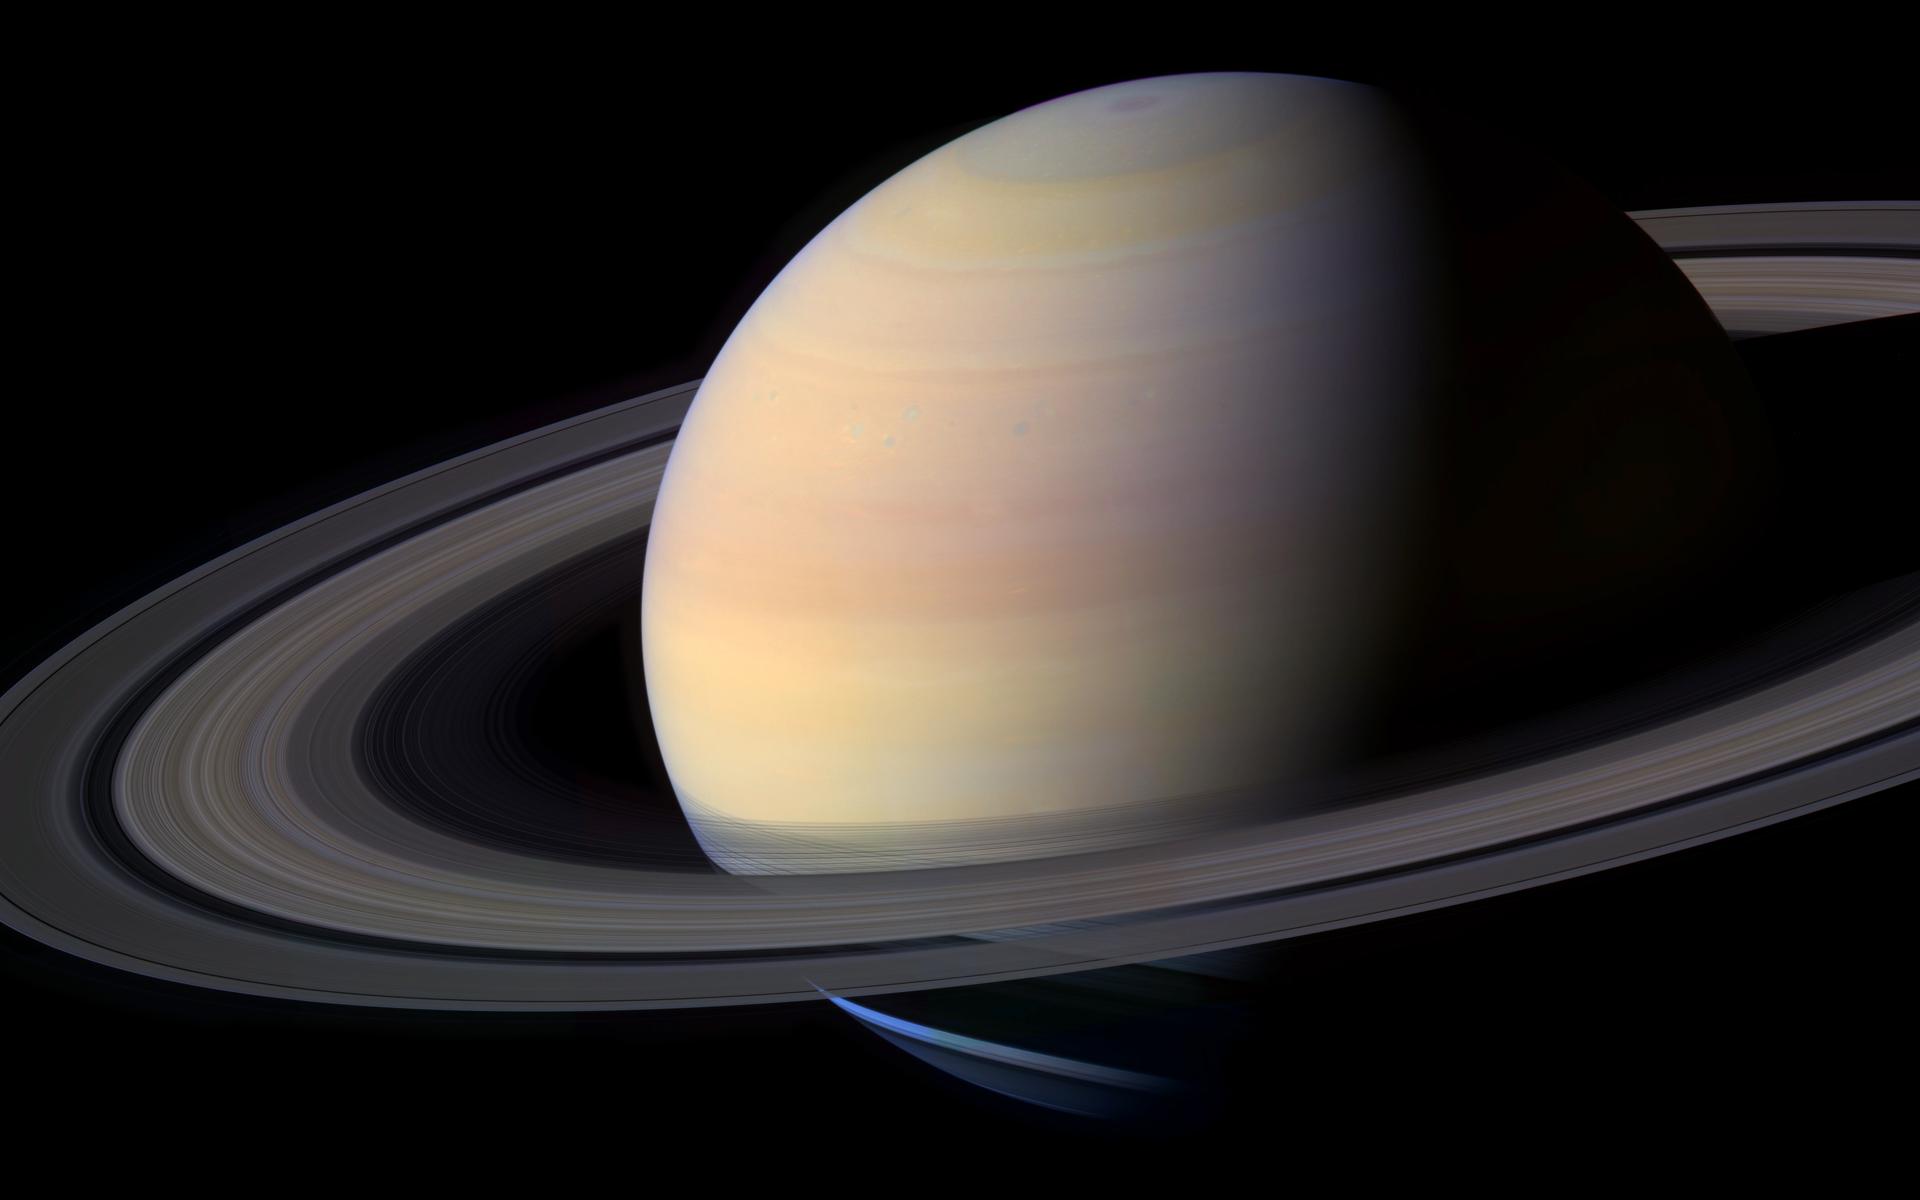 planete saturne